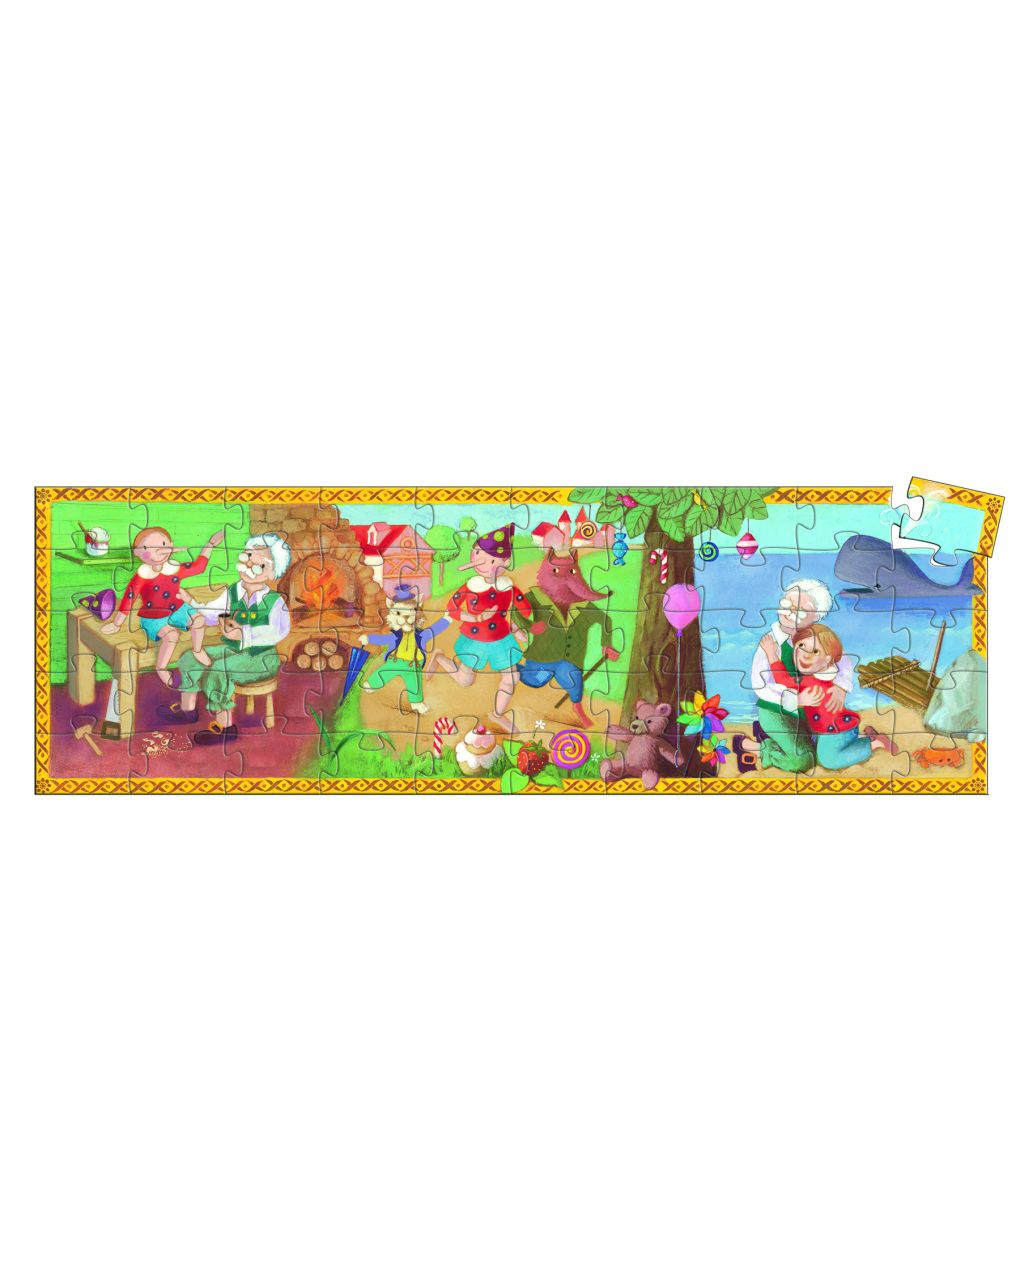 Djeco - pinocchio 50 pcs - puzzle sagomato - Djeco